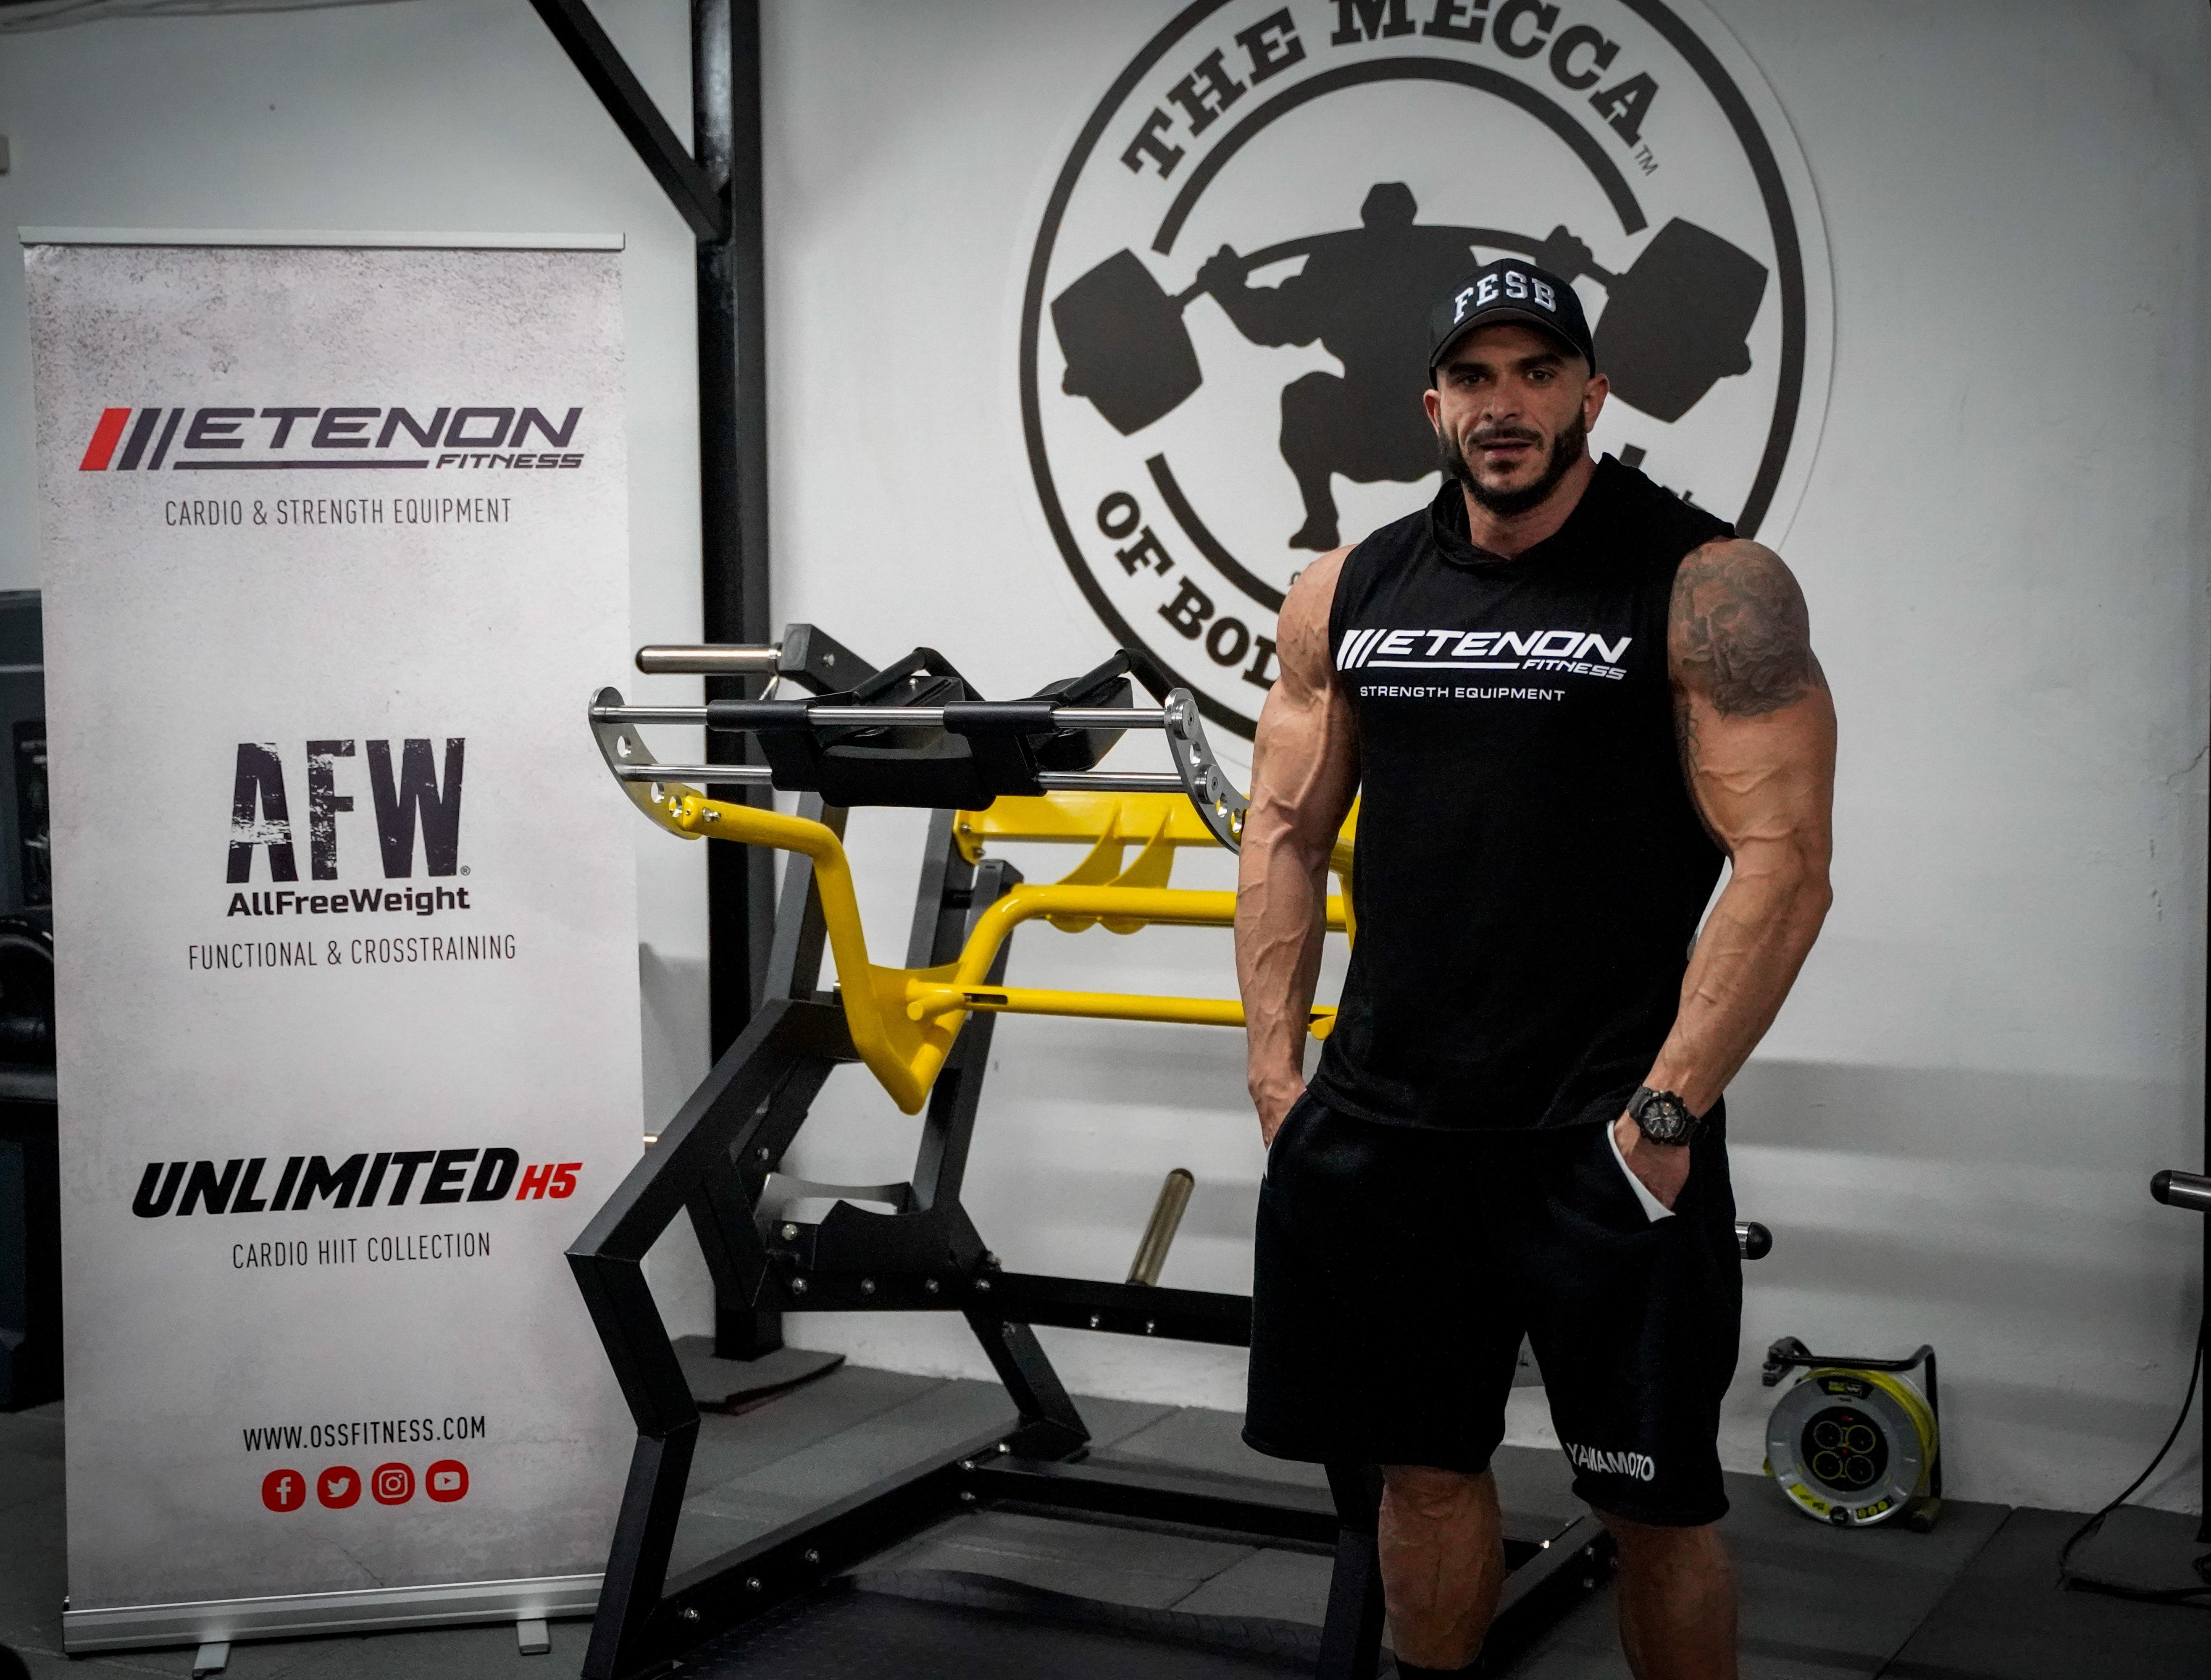 Etenon Fitness ficha a la joven promesa Fede Guevara